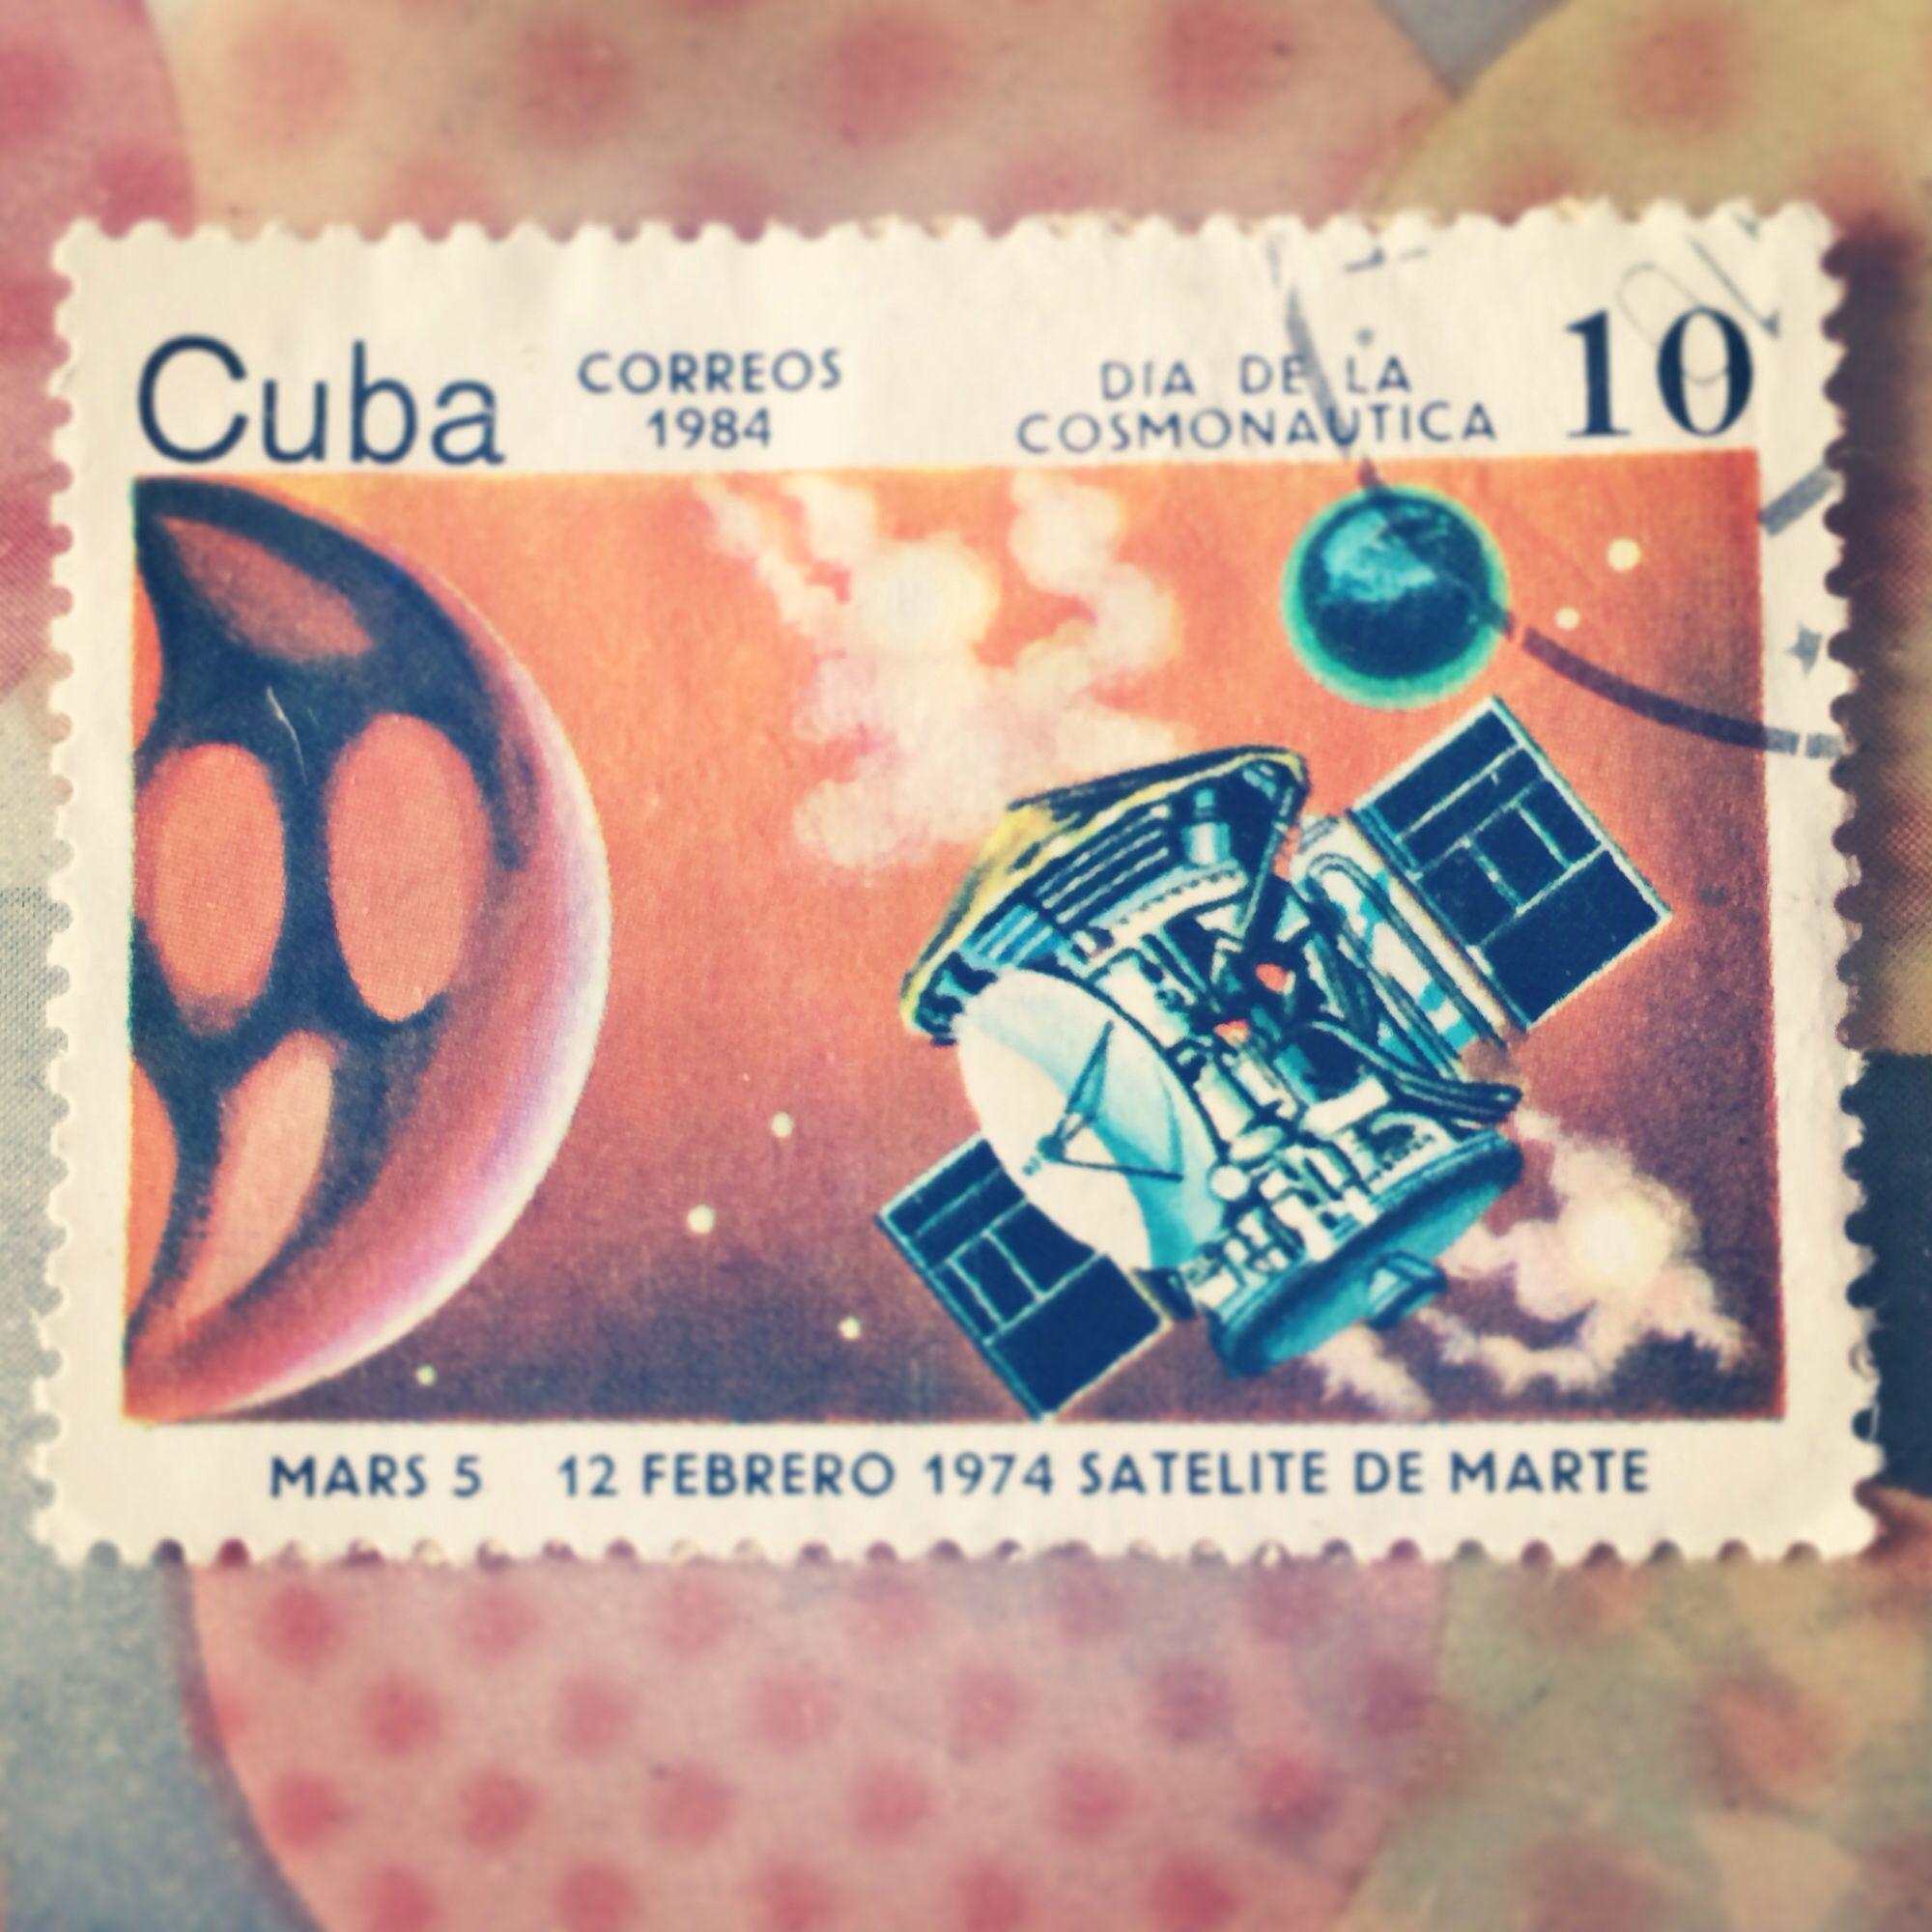 Cuba Correos stamp, year 1984